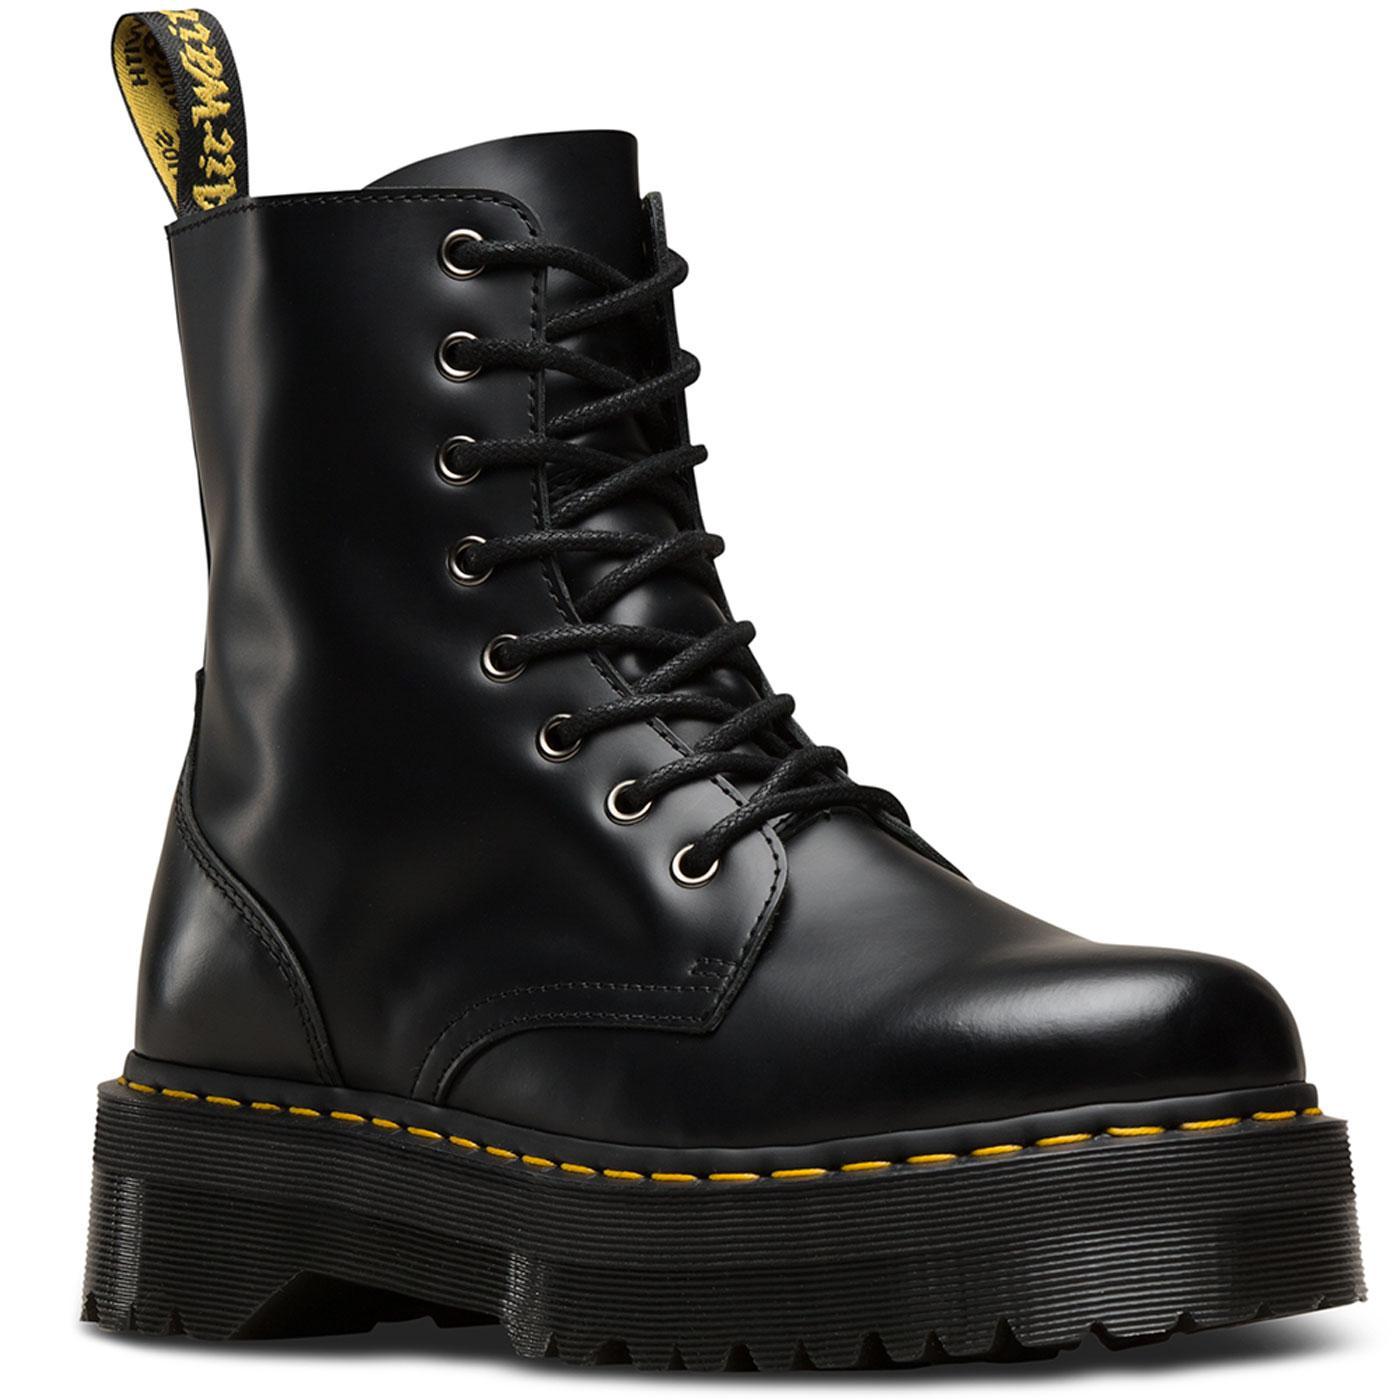 Jadon DR MARTENS Retro Smooth Platform Boots BLACK